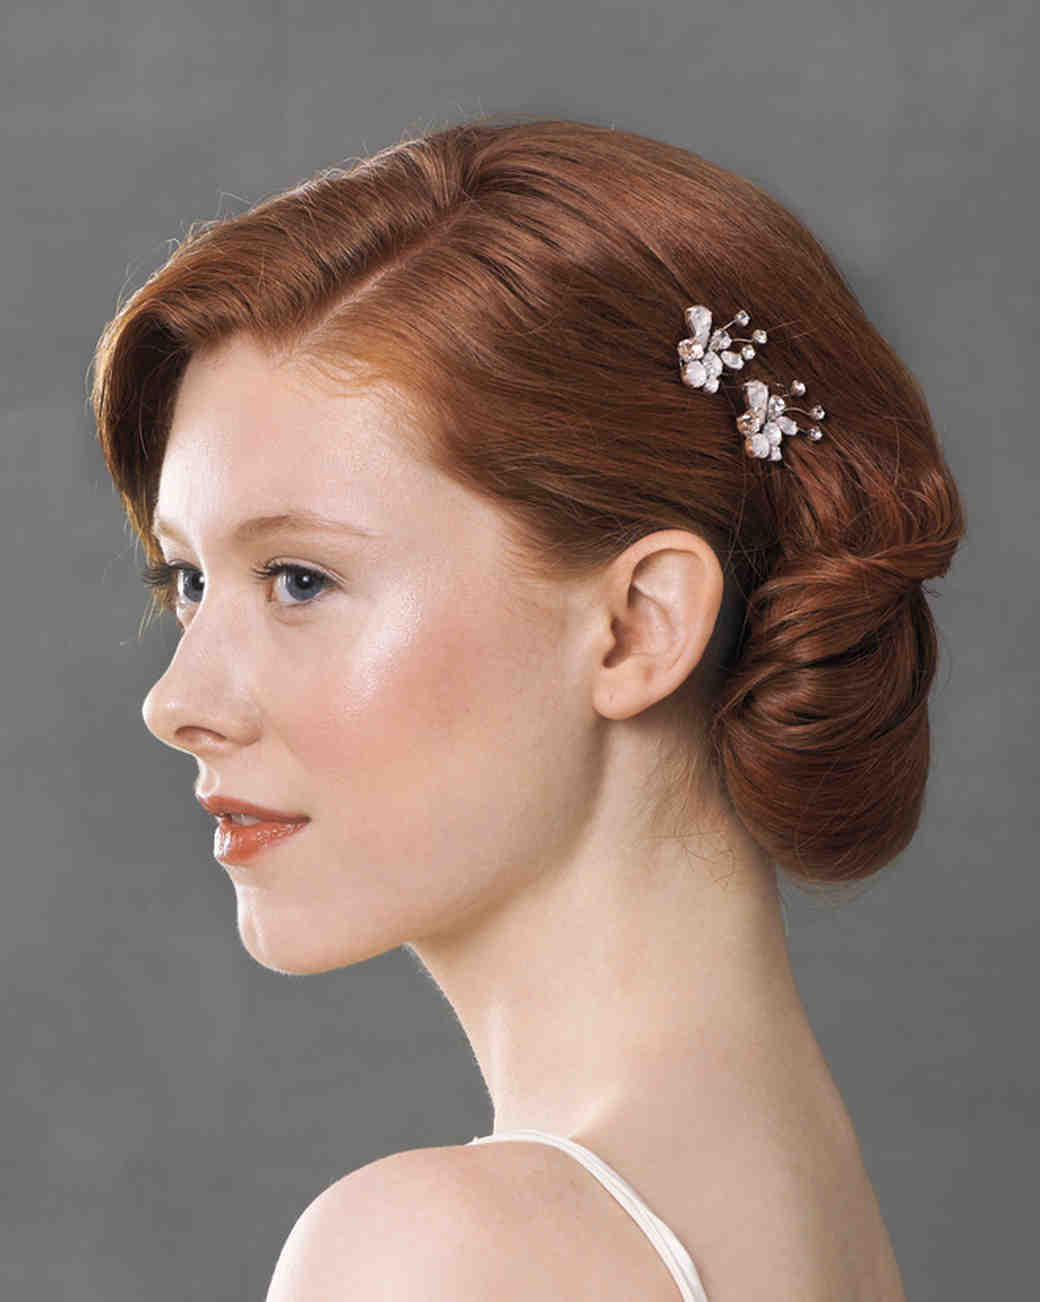 beauty-hair-d-mwd108909.jpg